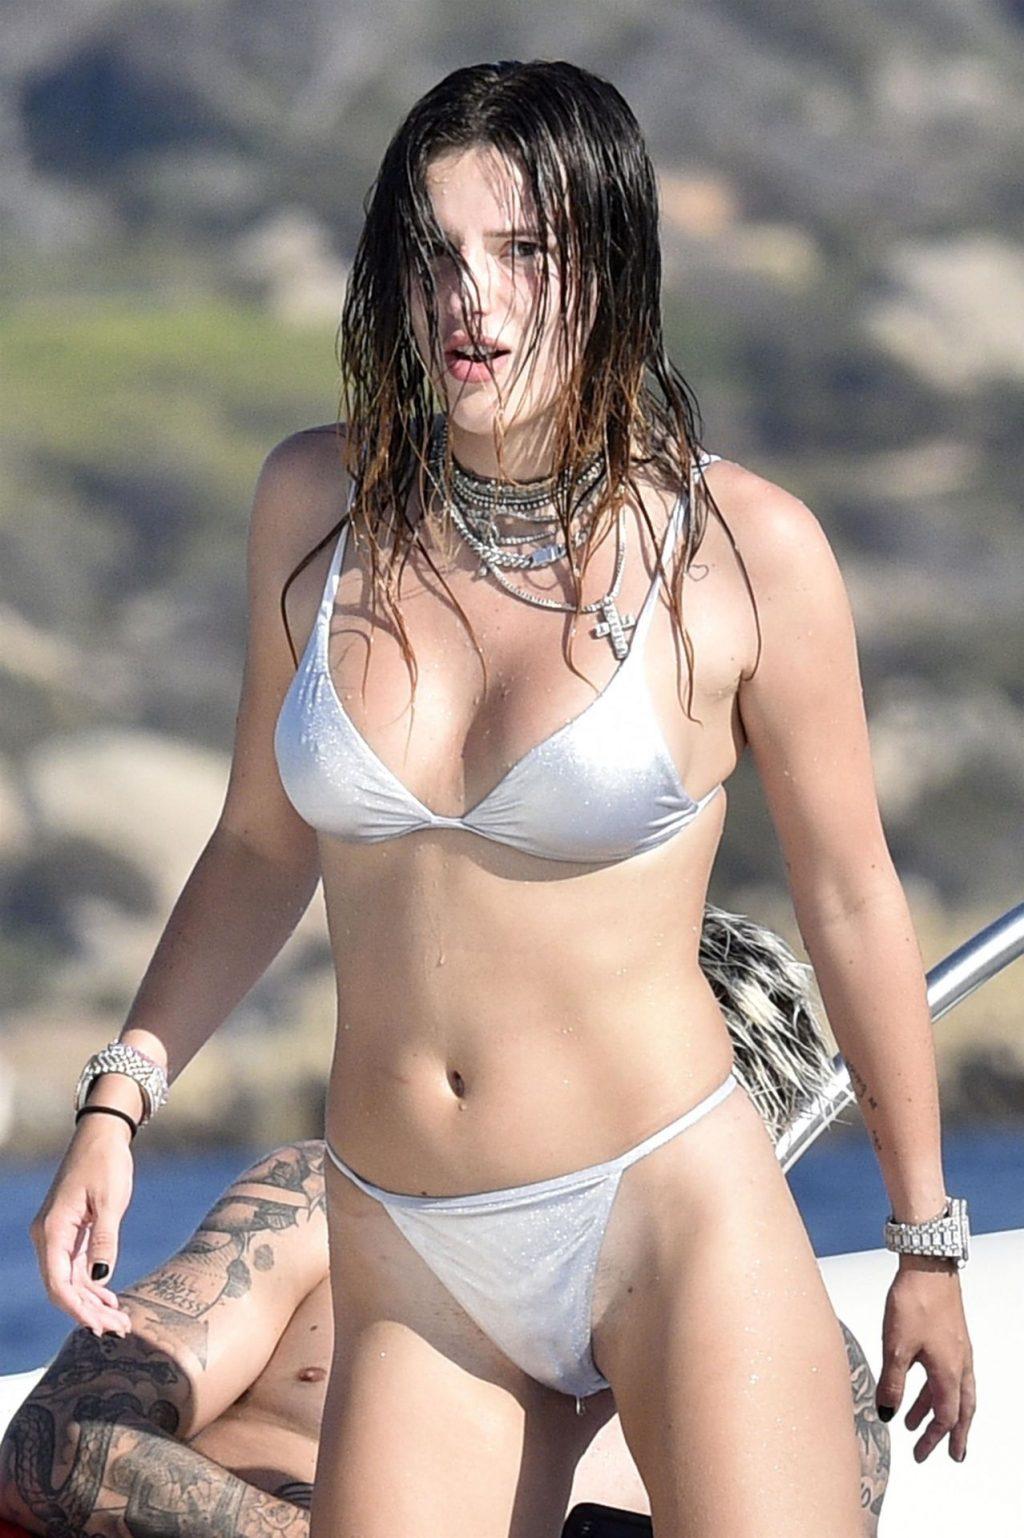 Bella Thorne Sexy Thefappeningblog Com 54 1 1024x1538